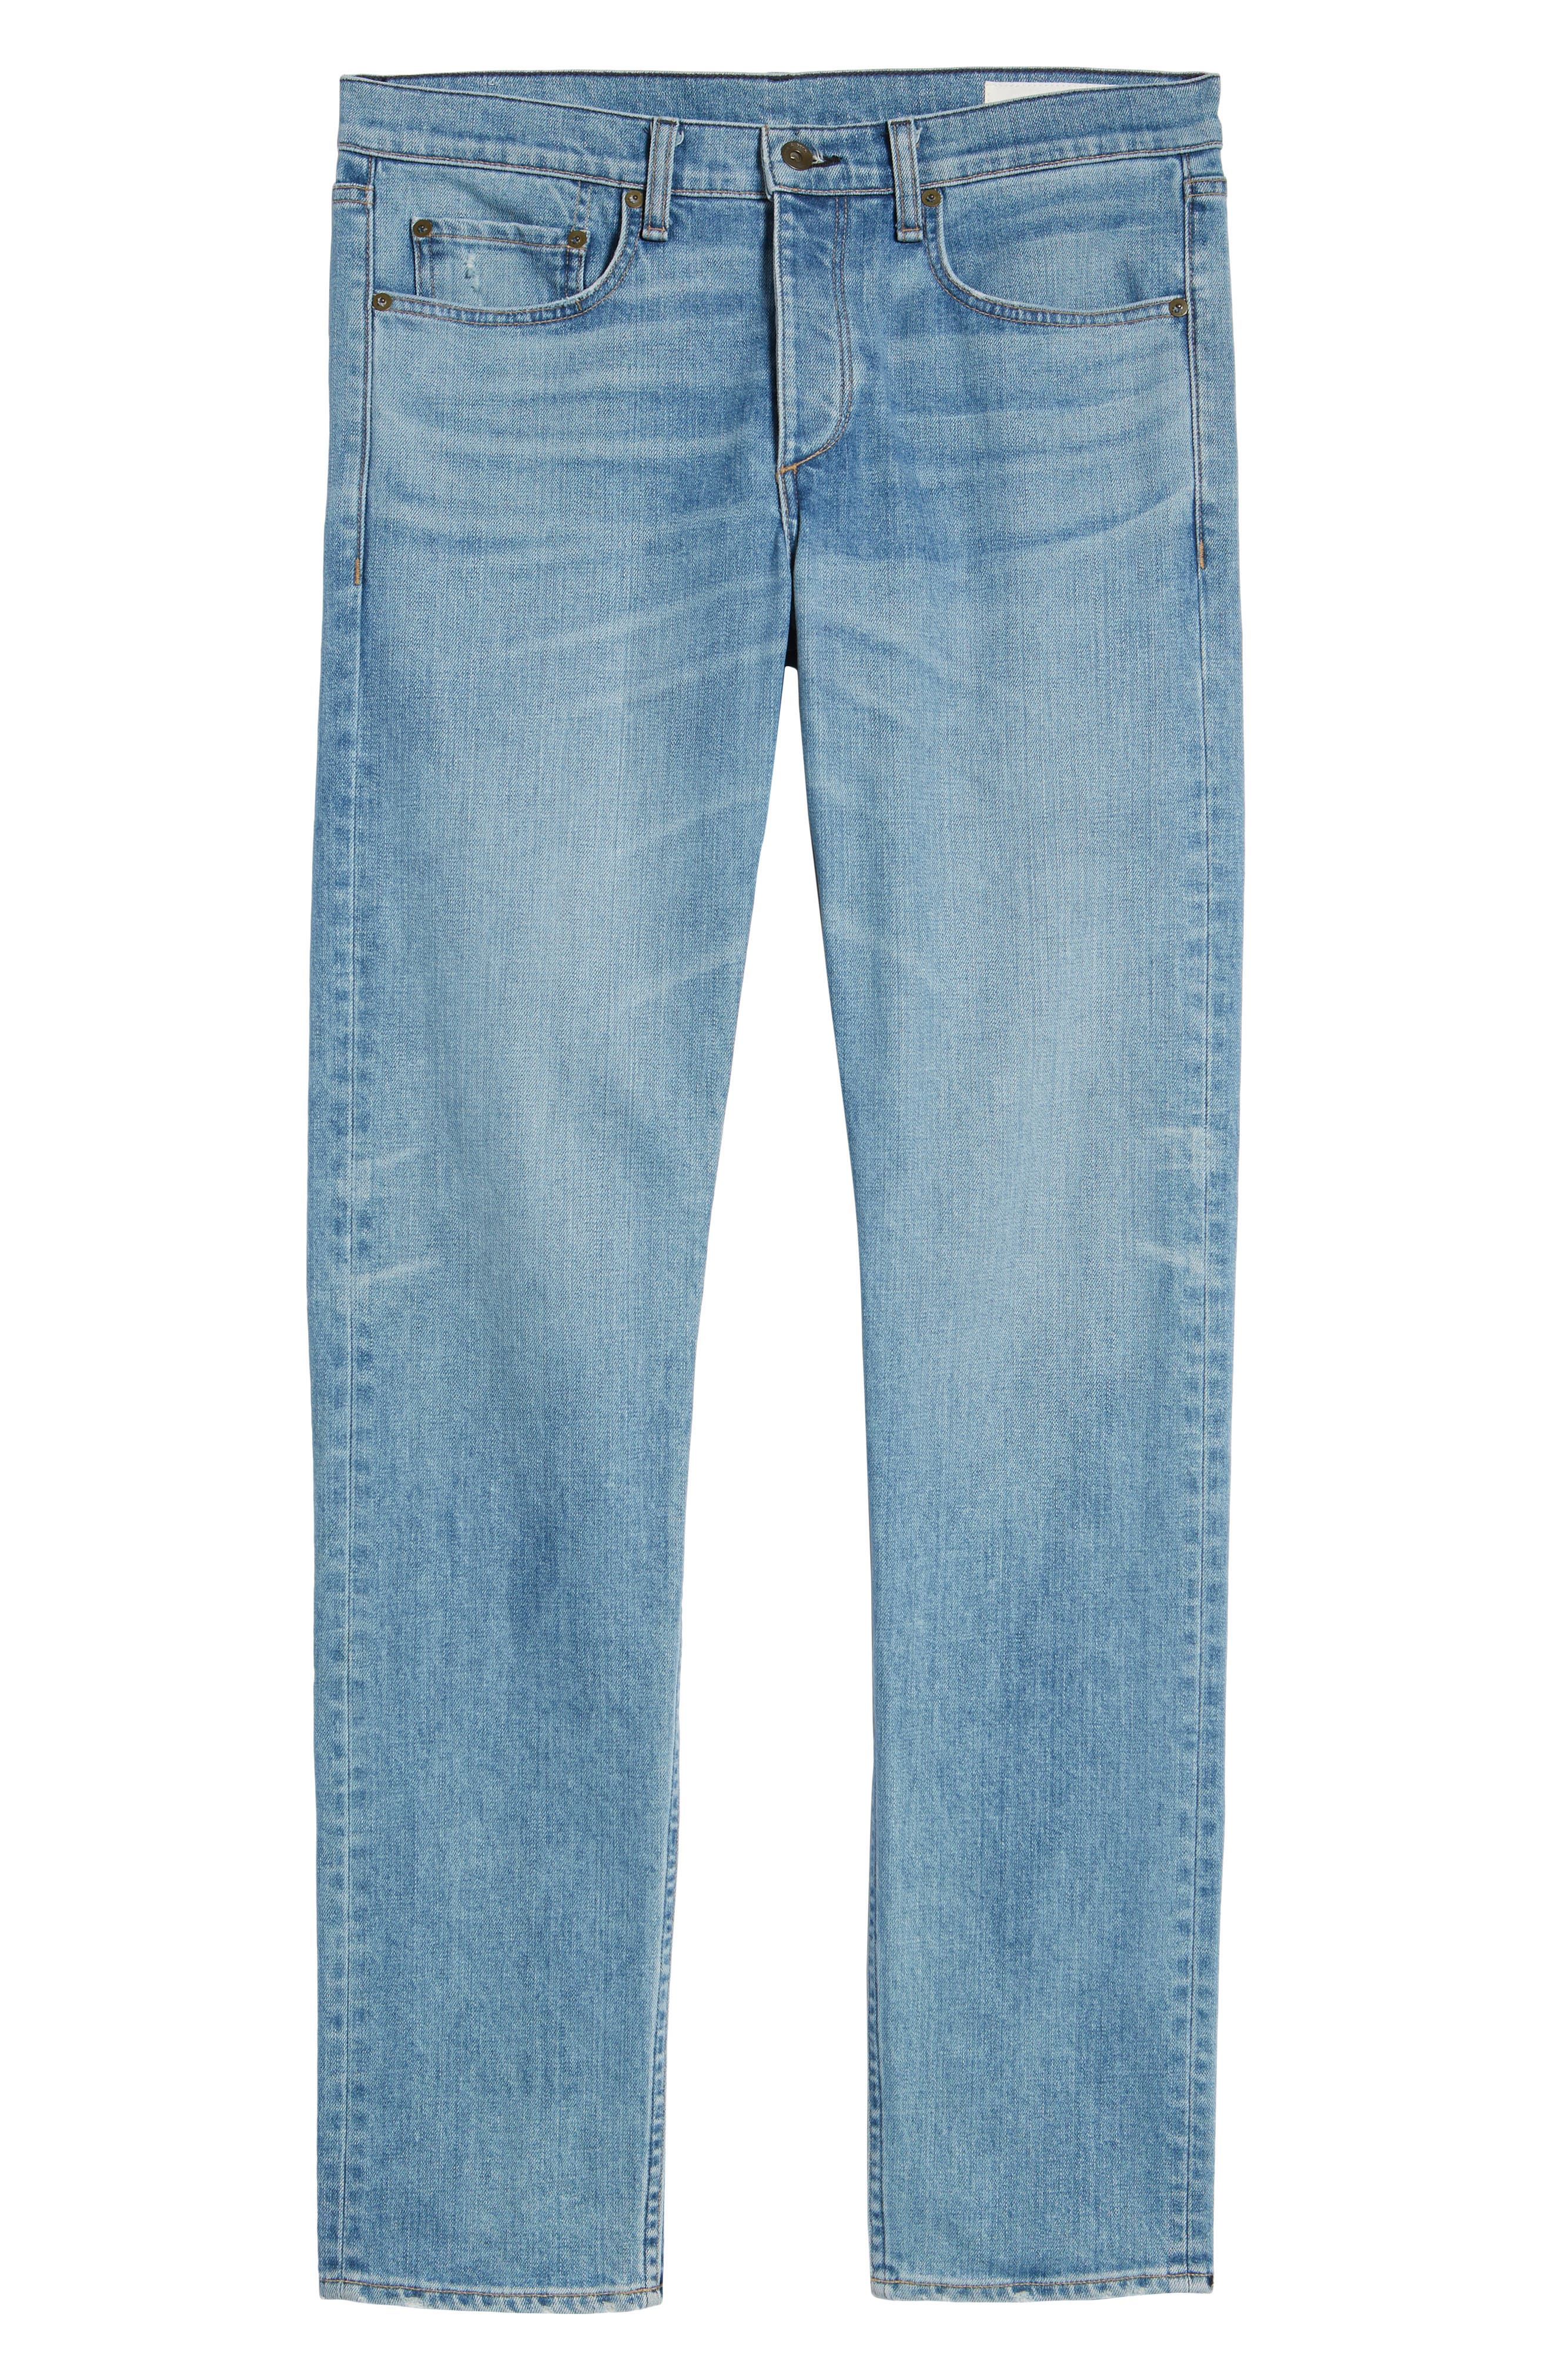 Fit 2 Slim Fit Jeans,                             Alternate thumbnail 6, color,                             PYLLE